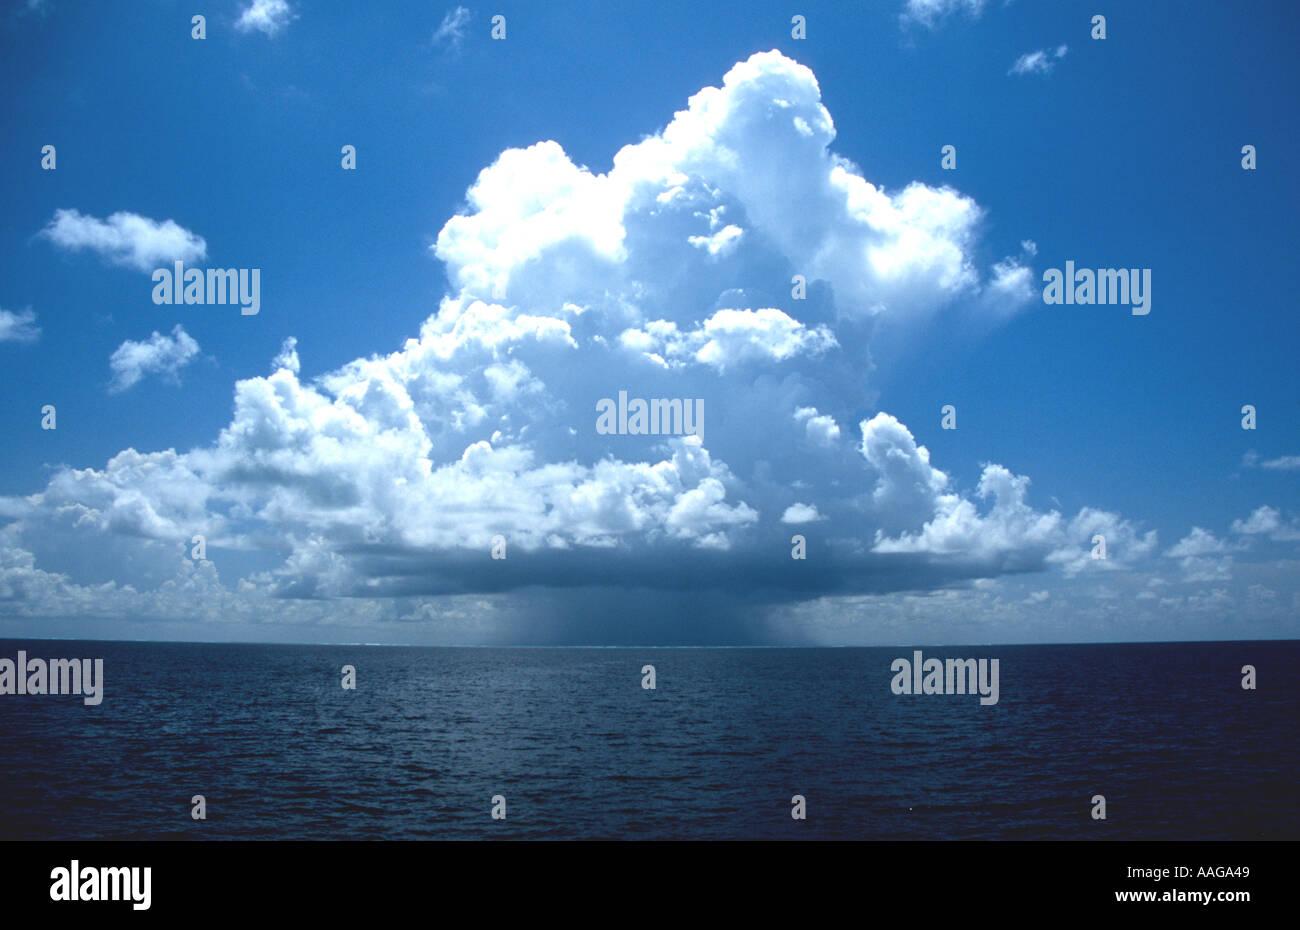 Cumulonimbus clouds with rain precipitation falling on the sea Southern Ari Atoll Alifu Maldives - Stock Image